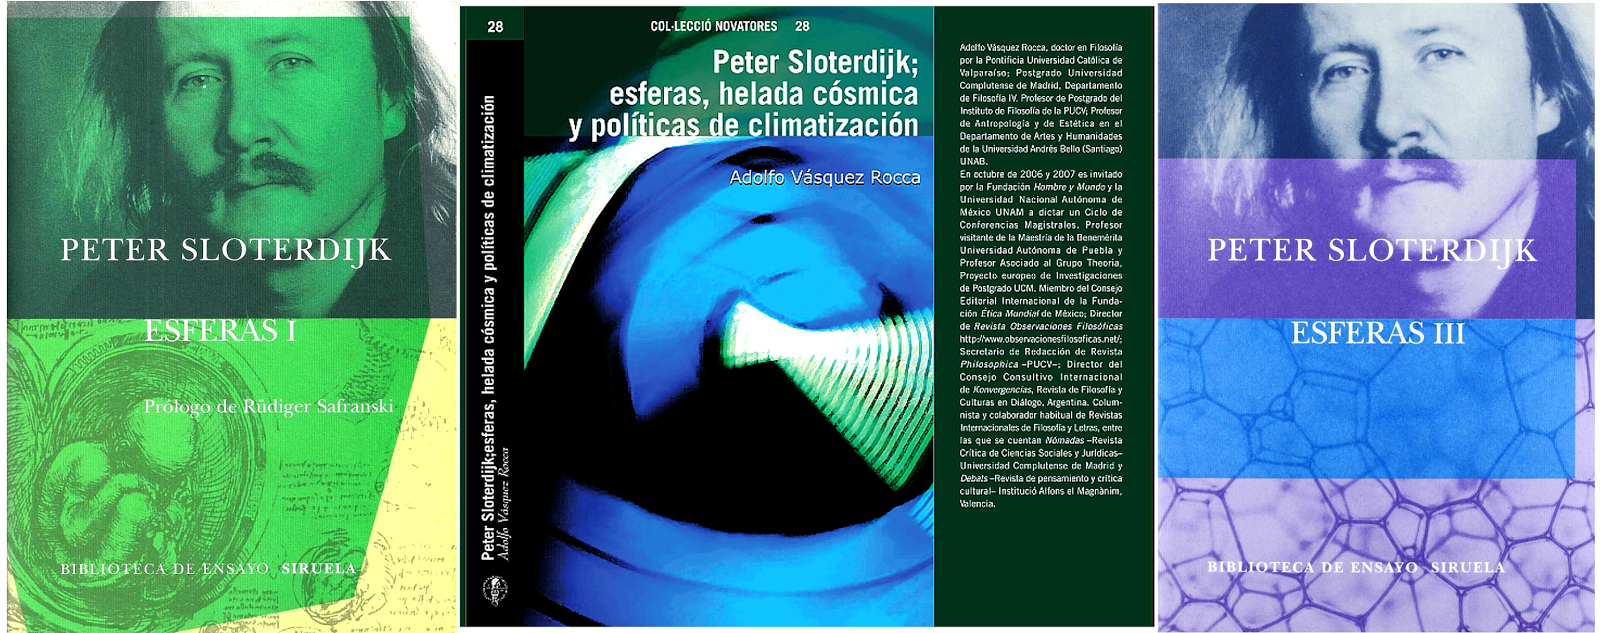 http://4.bp.blogspot.com/-r6aeTahmutM/U1WILFdmlCI/AAAAAAAASQk/oEbPcDj5gH0/s1600/ESFERAS+_+Libro+Esferas+_+Peter+Sloterdijk+_+Por+Adolfo+Vasquez+Rocca+D.Phil+_+Trilog%C3%ADa+Esferas+.png